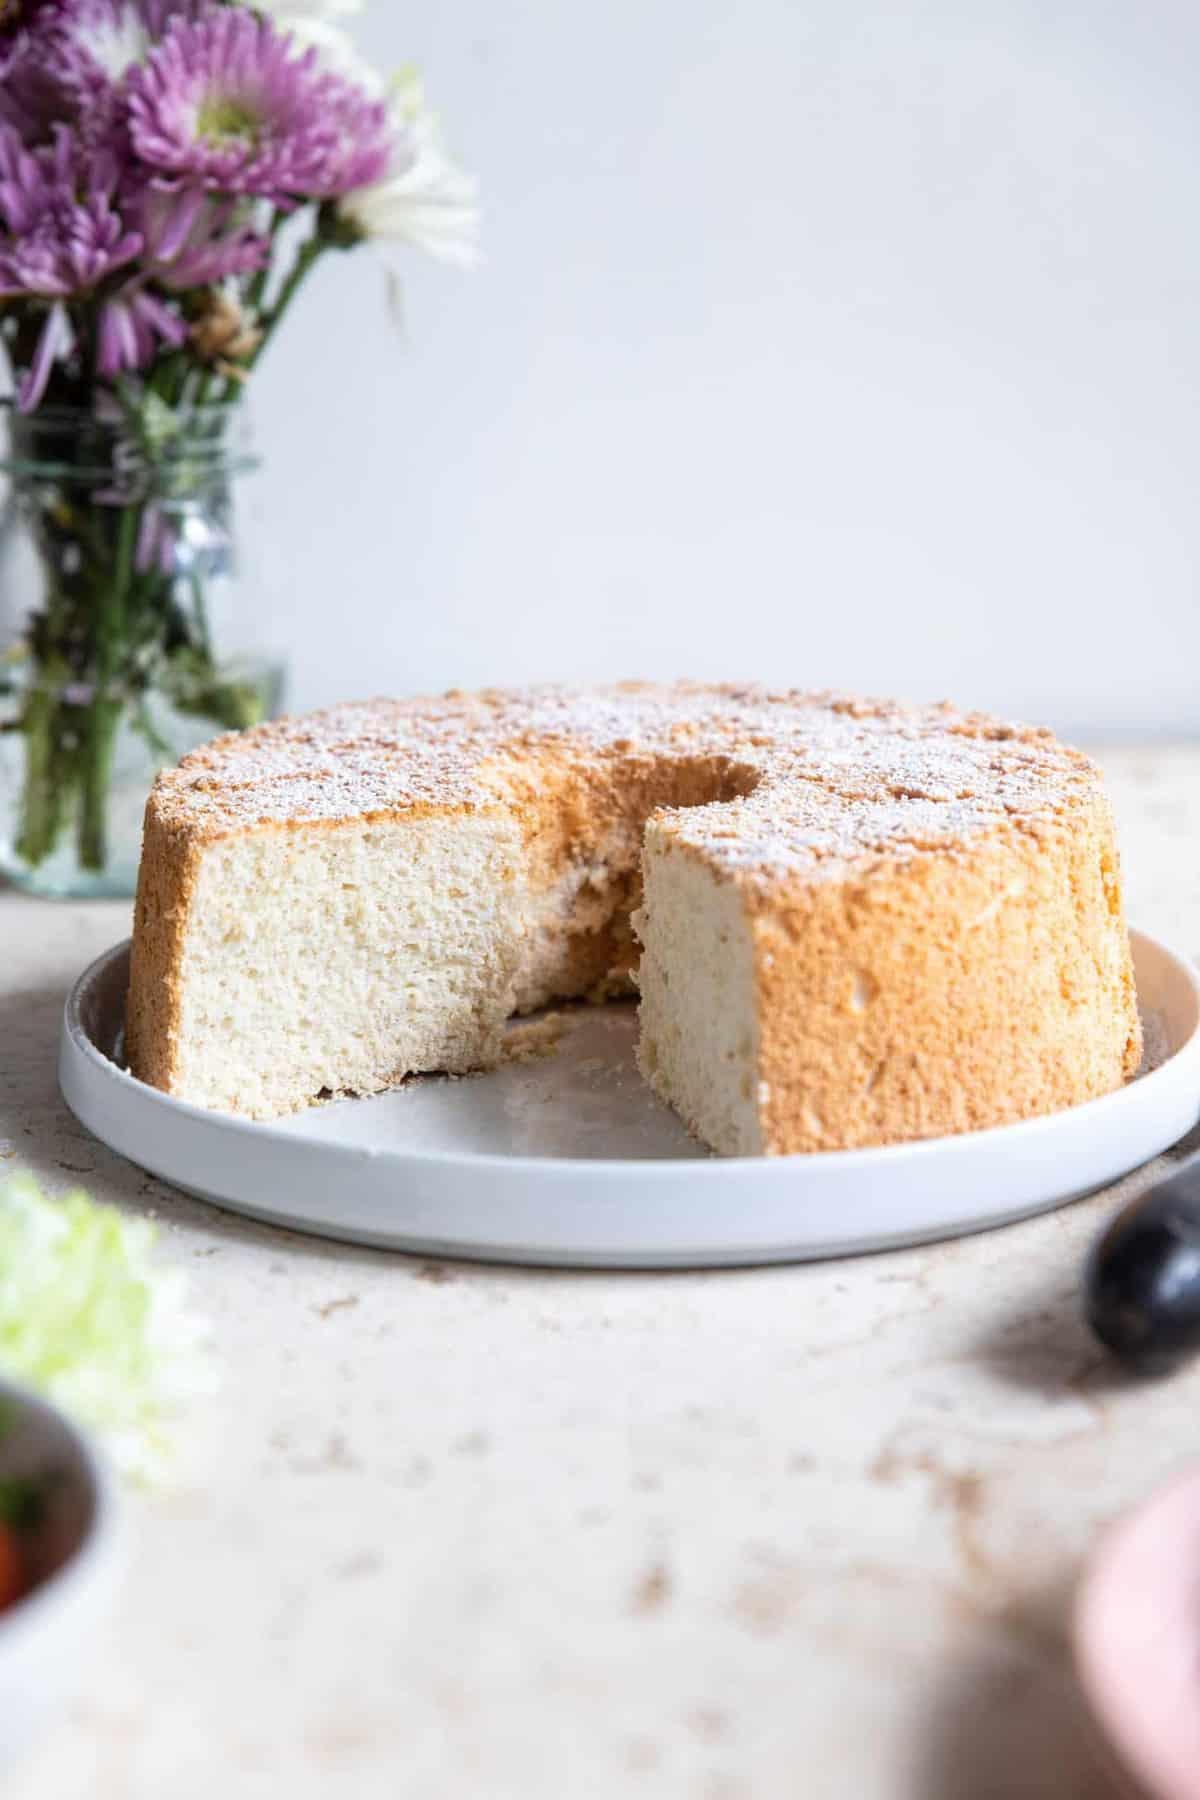 Sugar Free Angel Food Cake on a plate